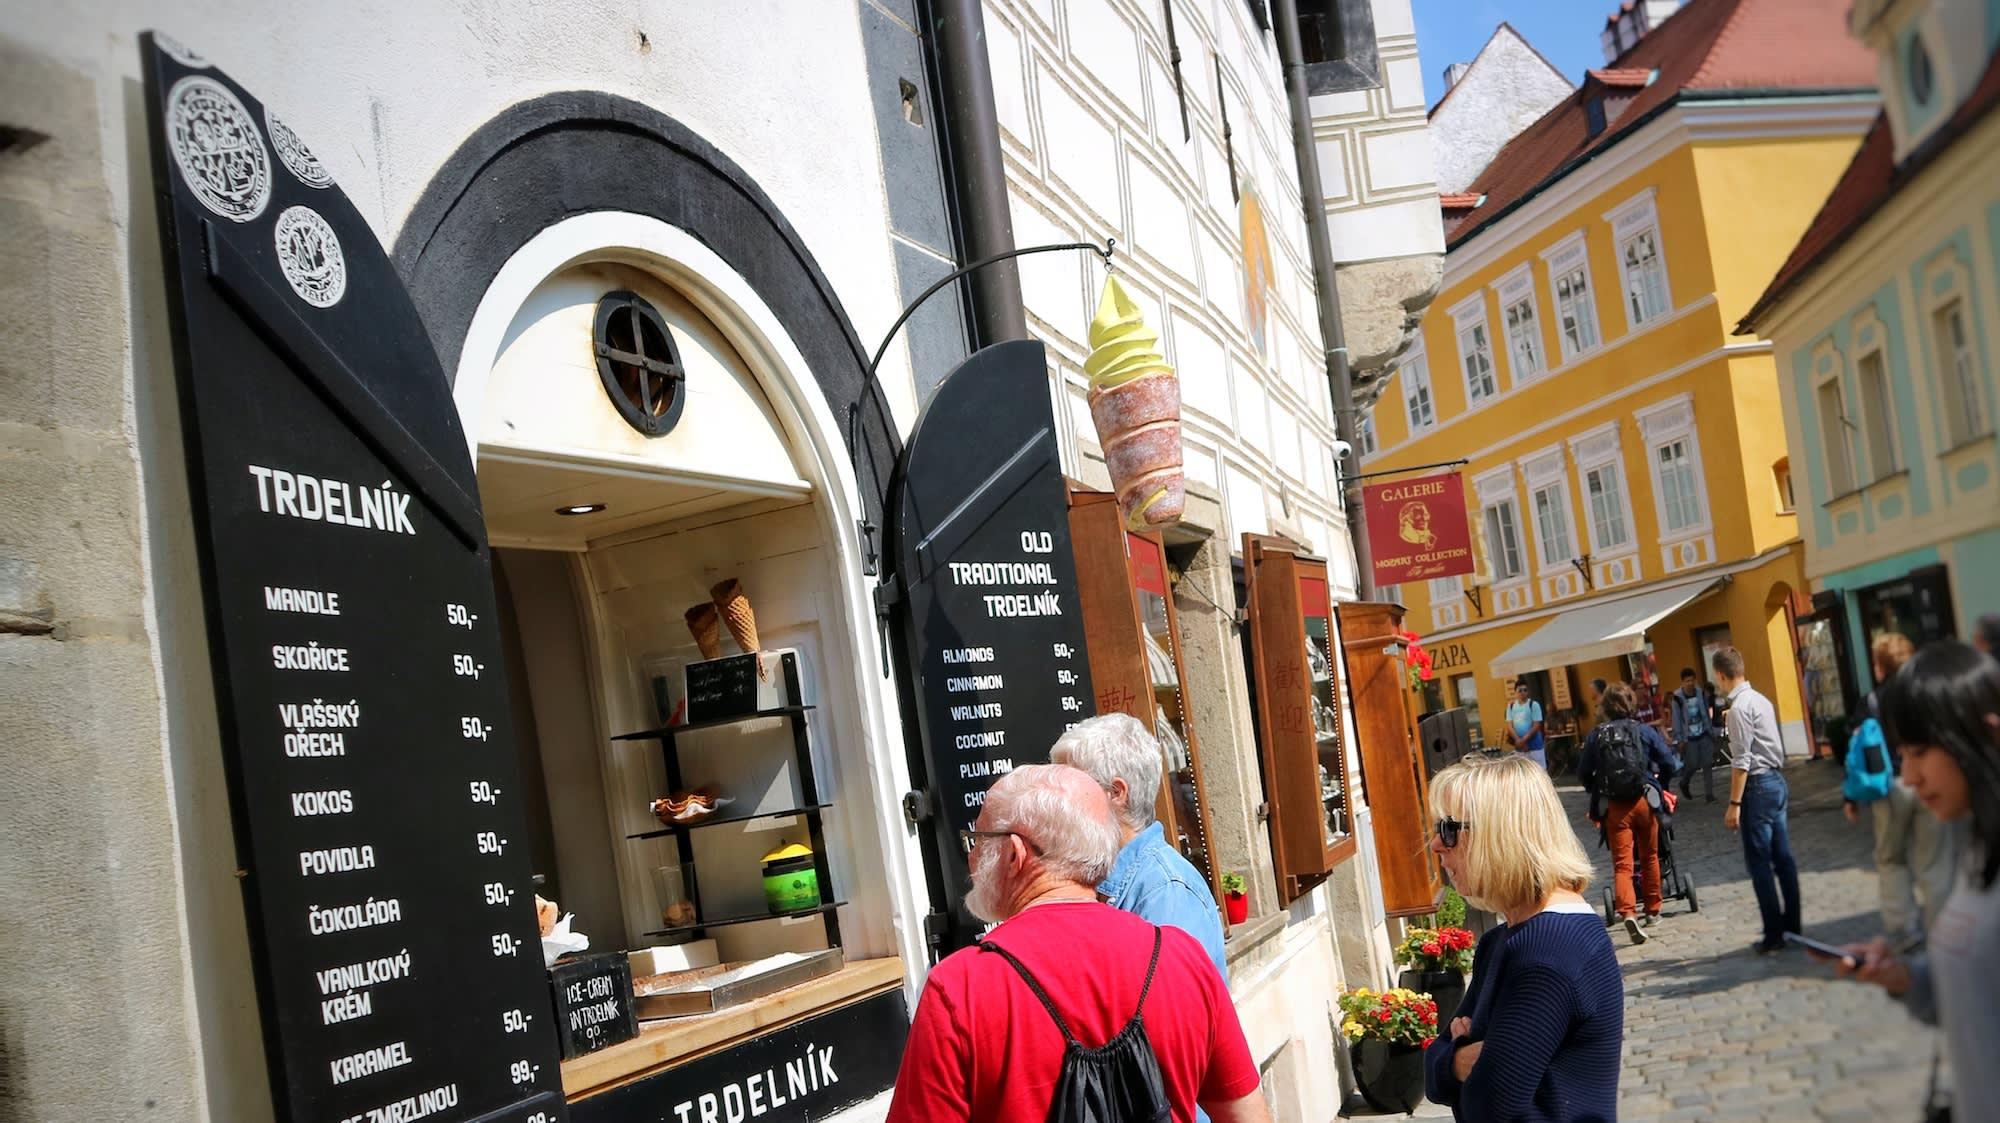 Trdelnik受觀光客歡迎,加冰淇淋也好吃。Photographer | Serina Su